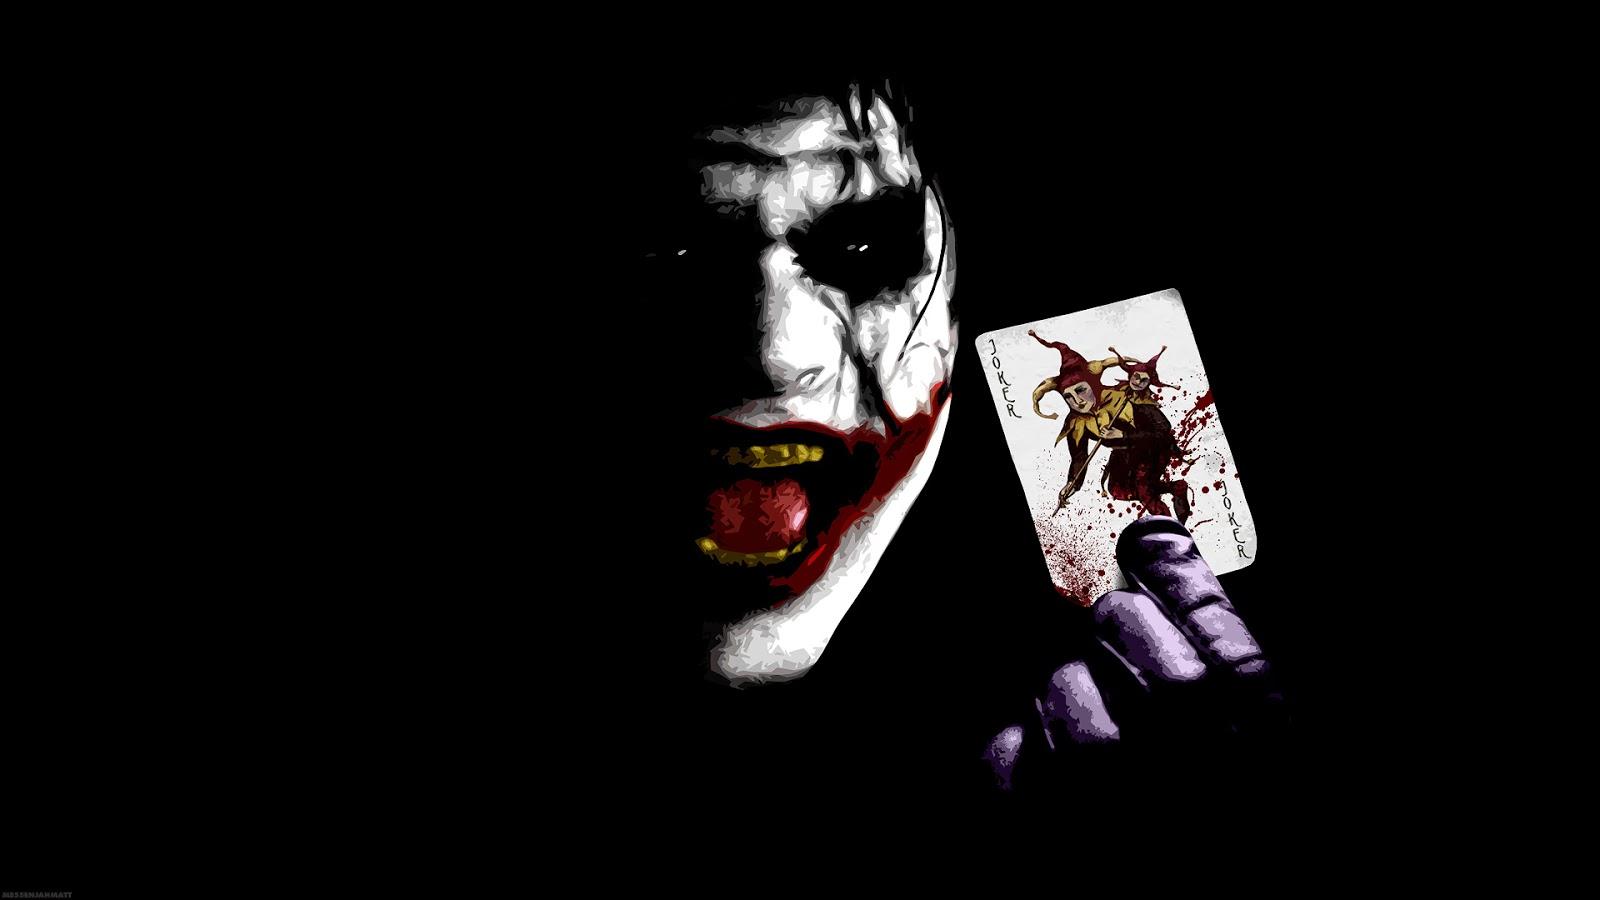 Wallpaper Joker Hd Gratis Download Deloiz Wallpaper